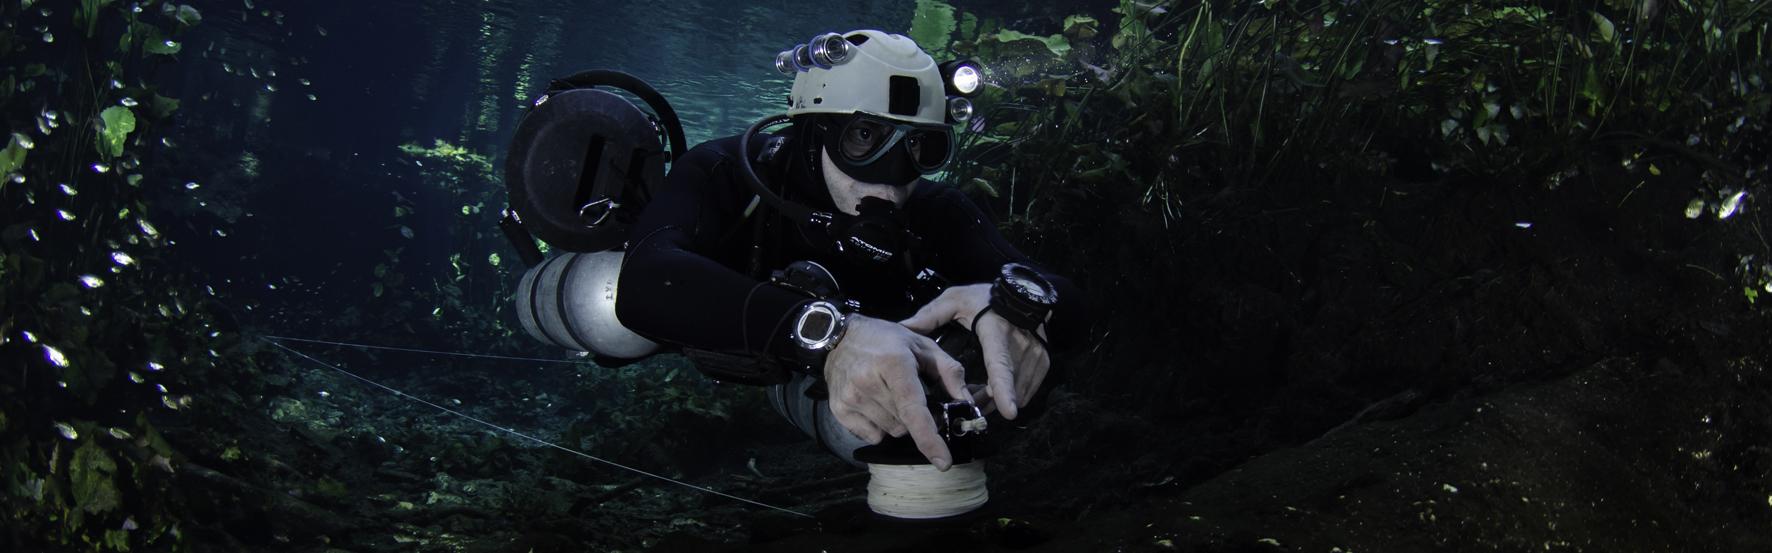 tec diving workshops, line laying workshops, try double tanks, under the jungle, tajma ha dive shop